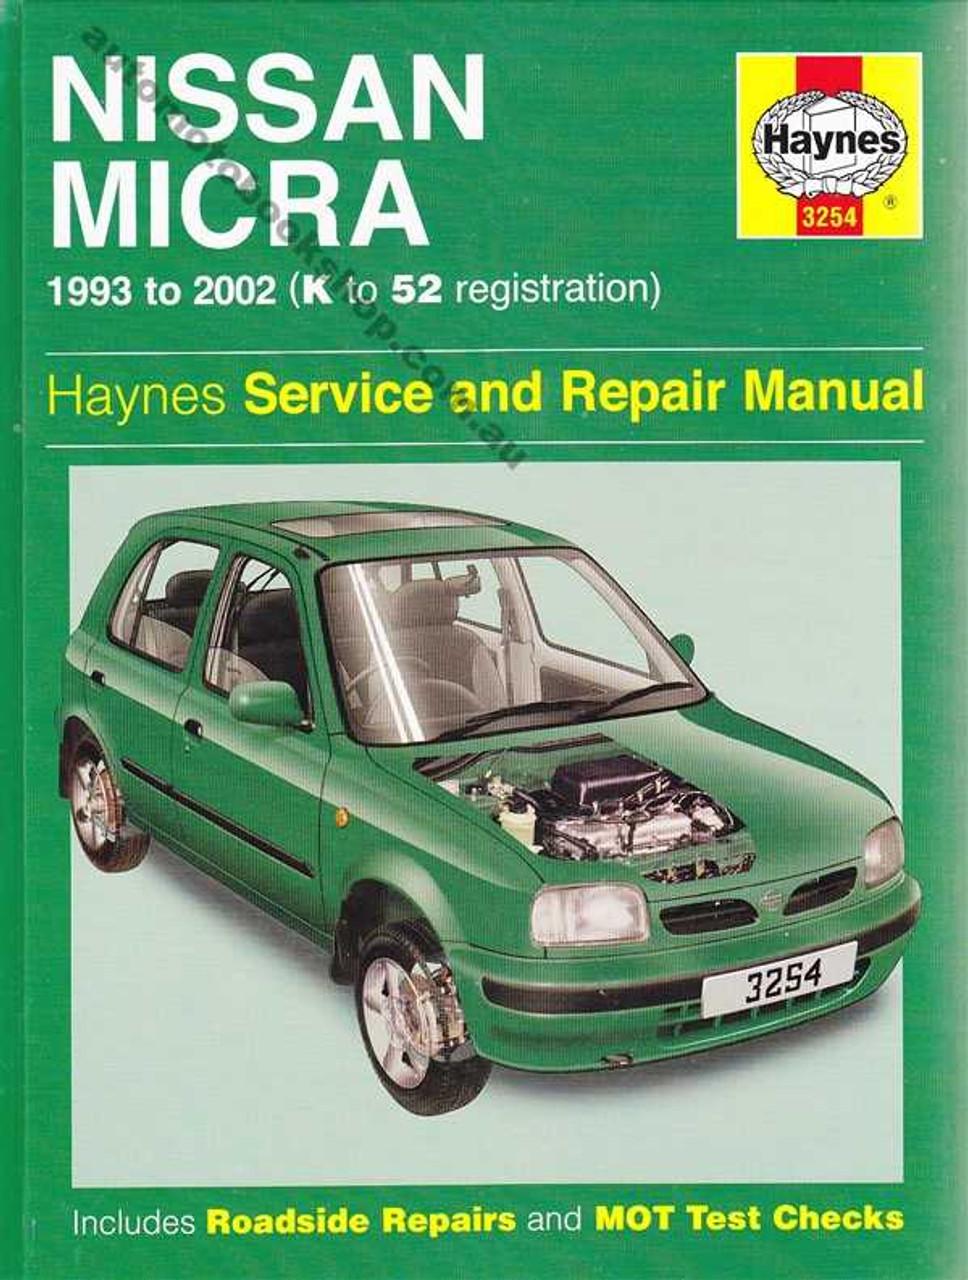 nissan micra 1993 2002 workshop manual rh automotobookshop com au Nissan Micra 2013 2007 Nissan Micra